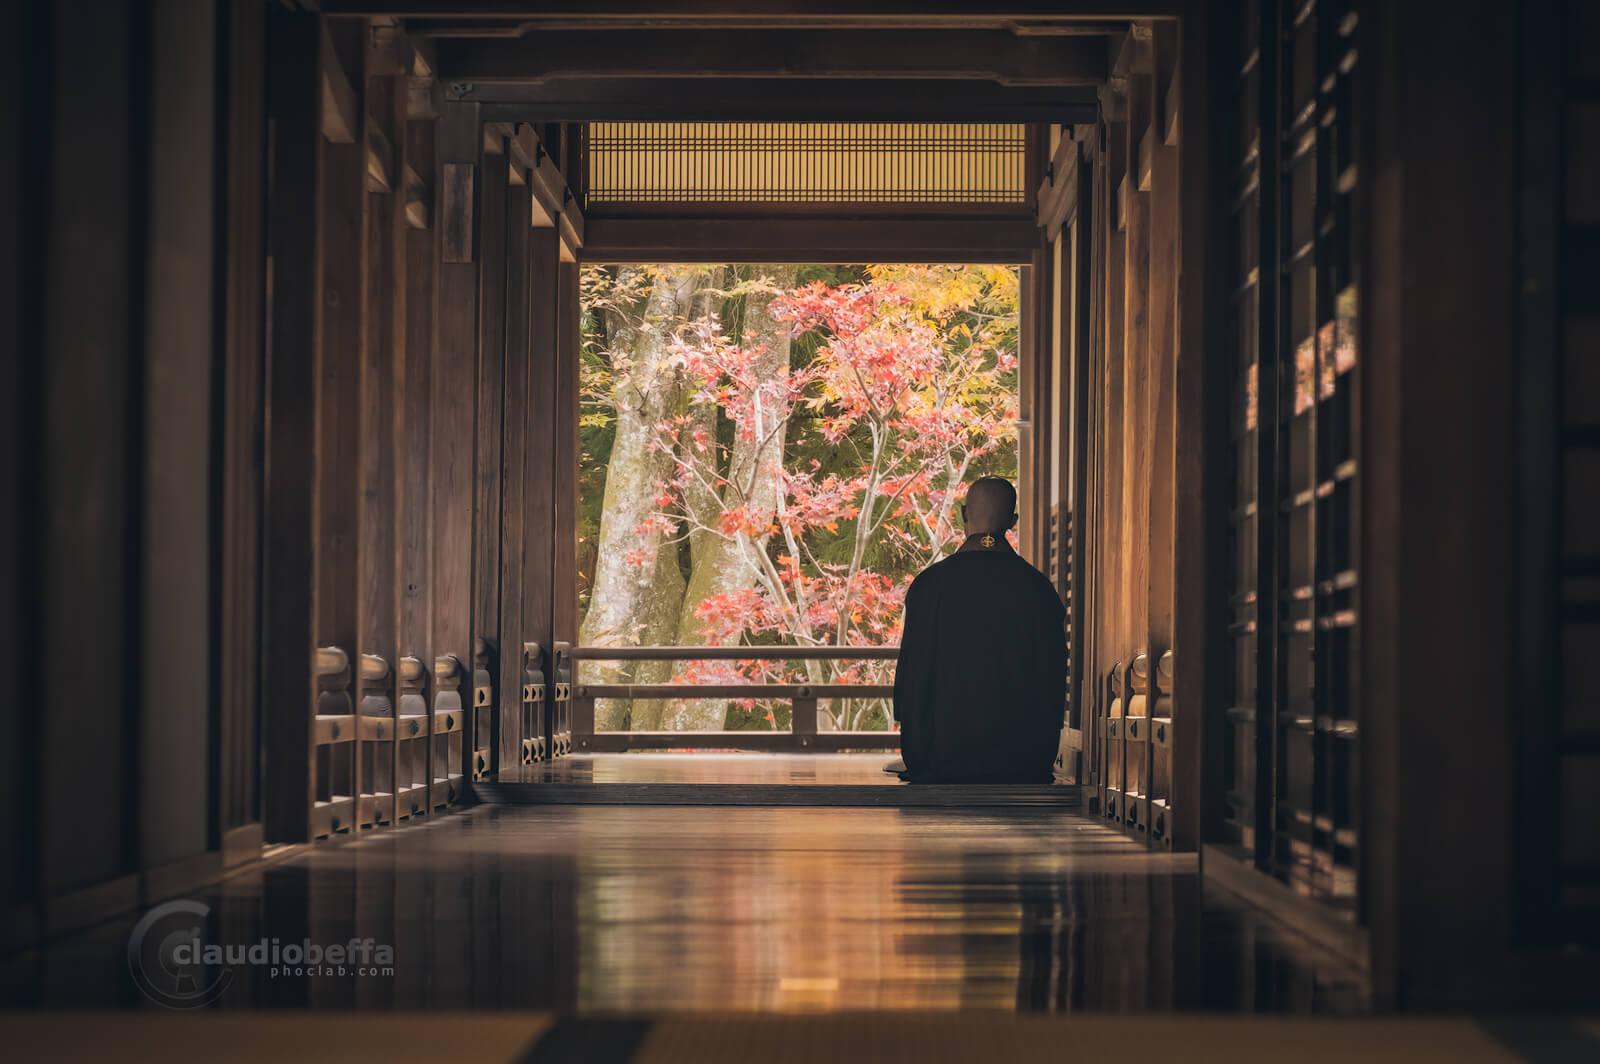 Buddhist monk contemplates Momiji, Nara, Japan, Tradition, Spirituality, Travel.